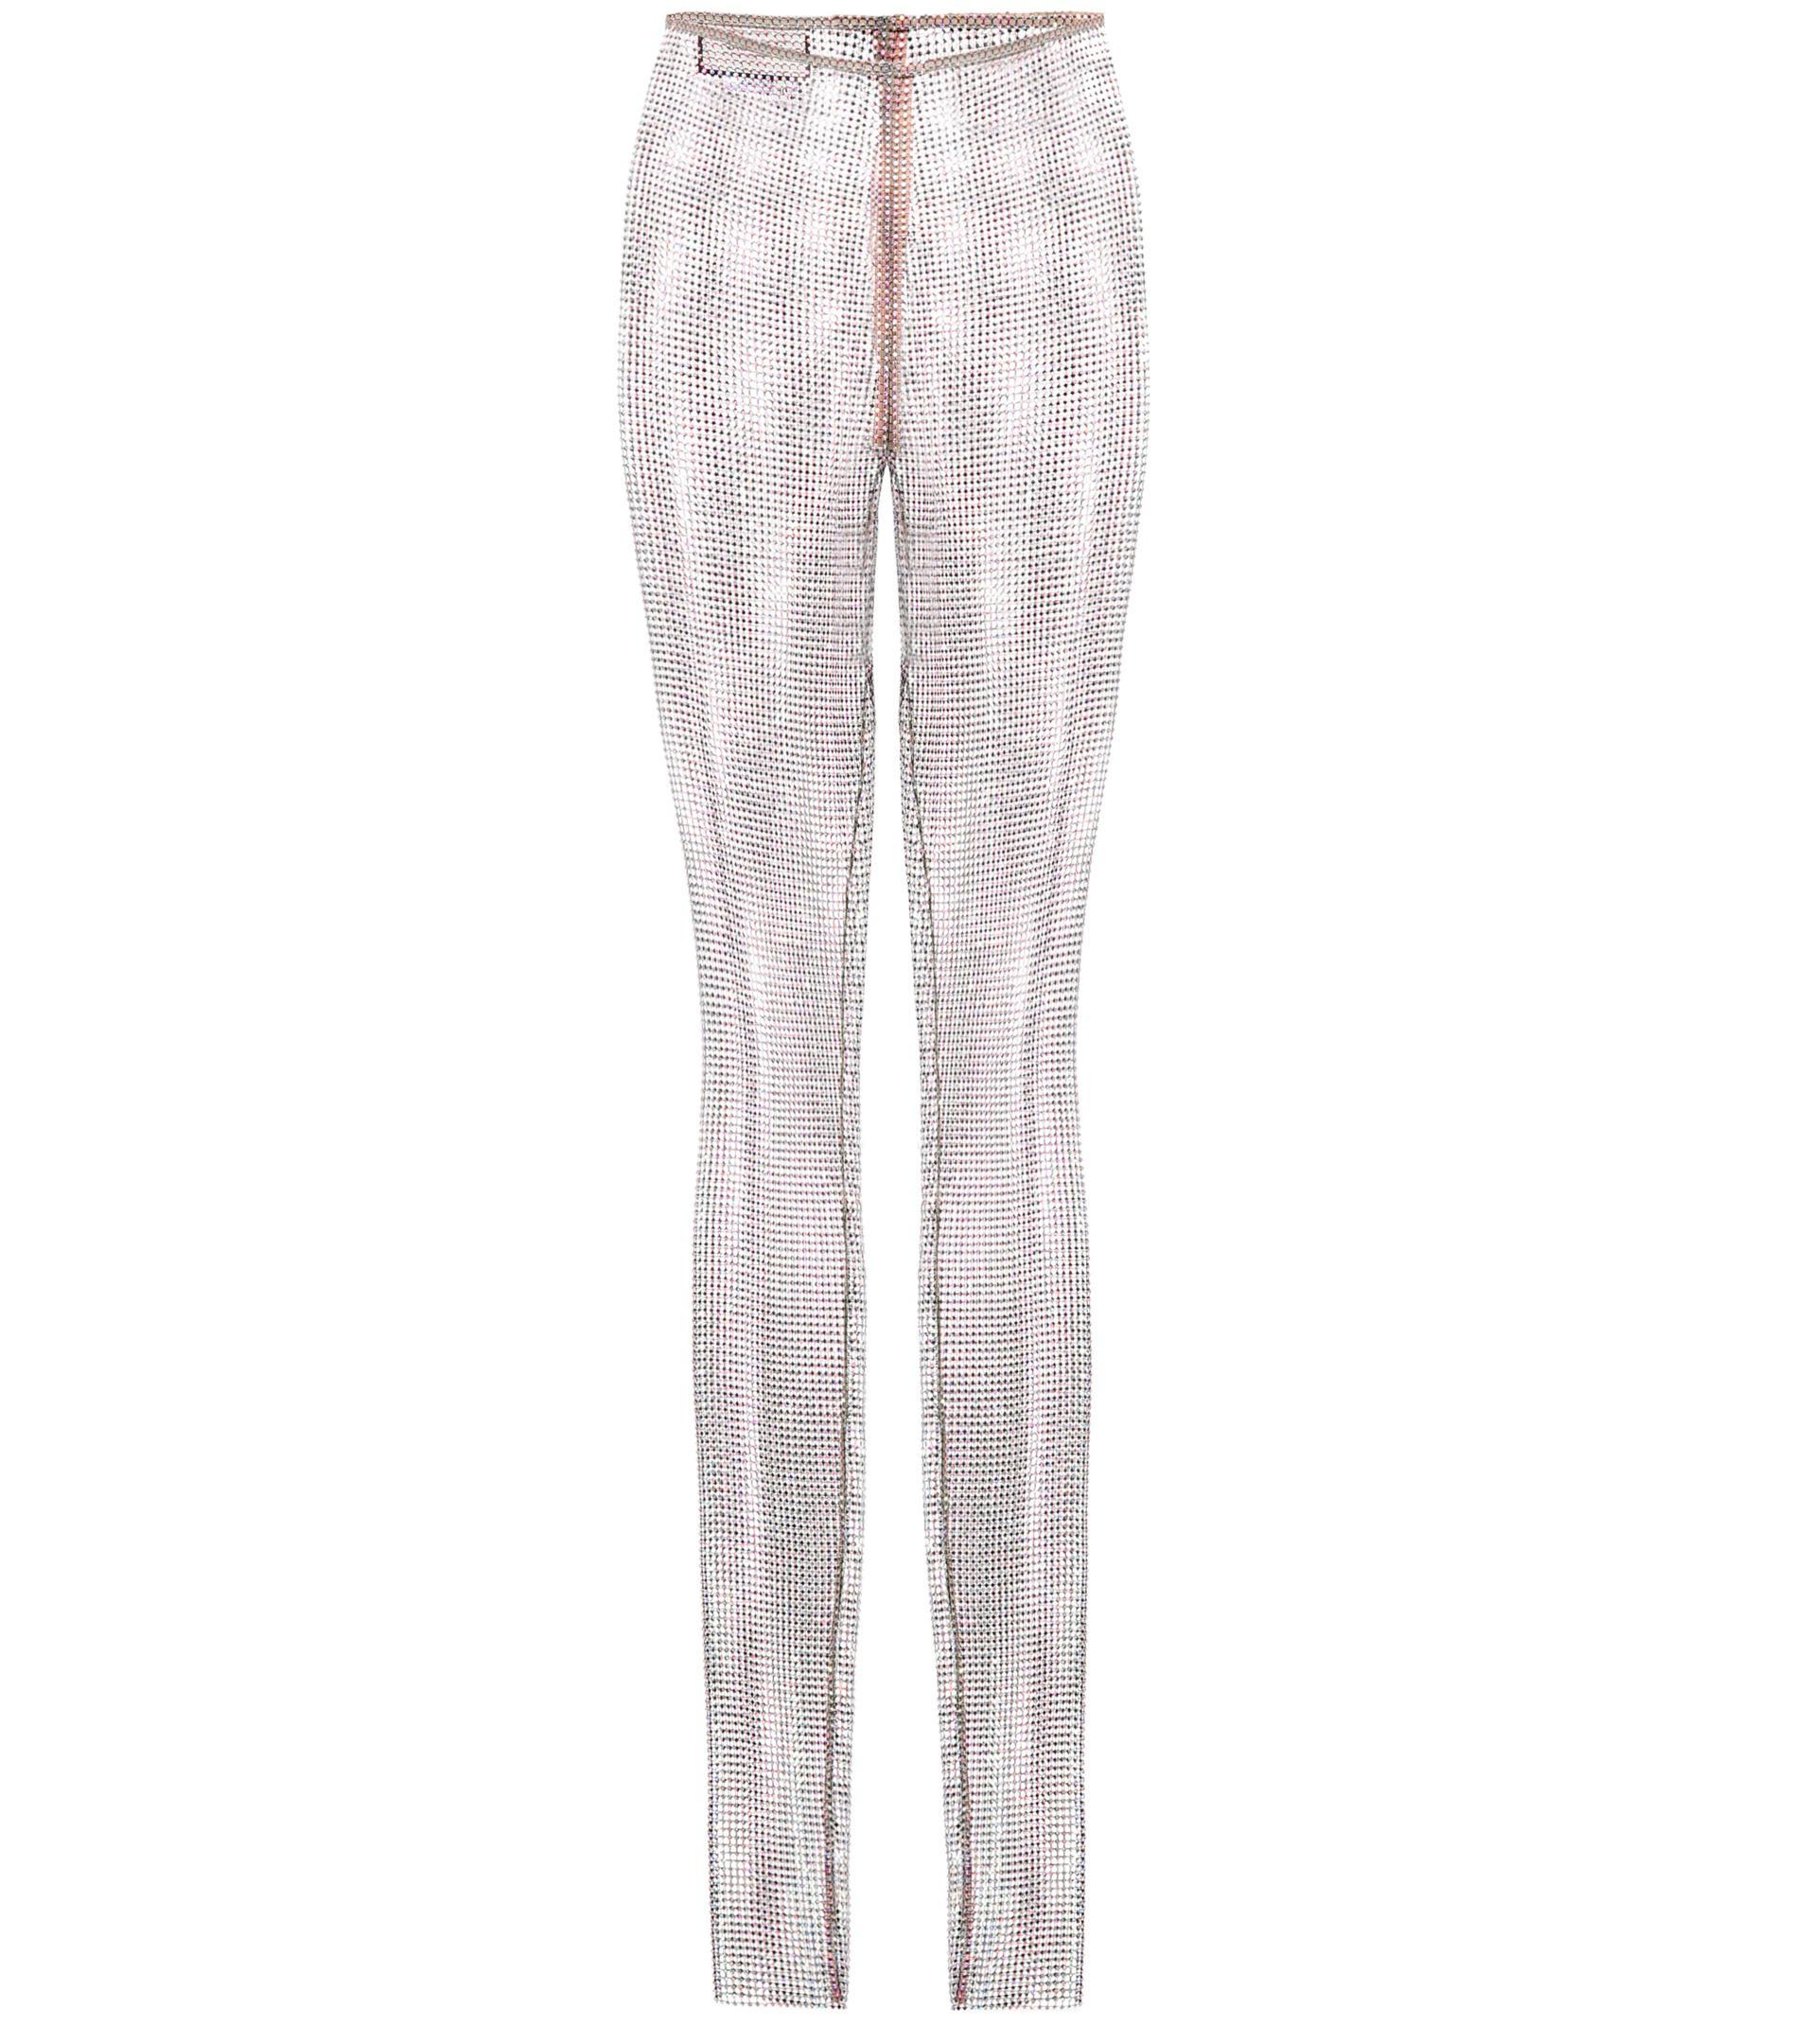 4572b4c4482 Lyst - Gucci Crystal-embellished Mesh Leggings in Metallic